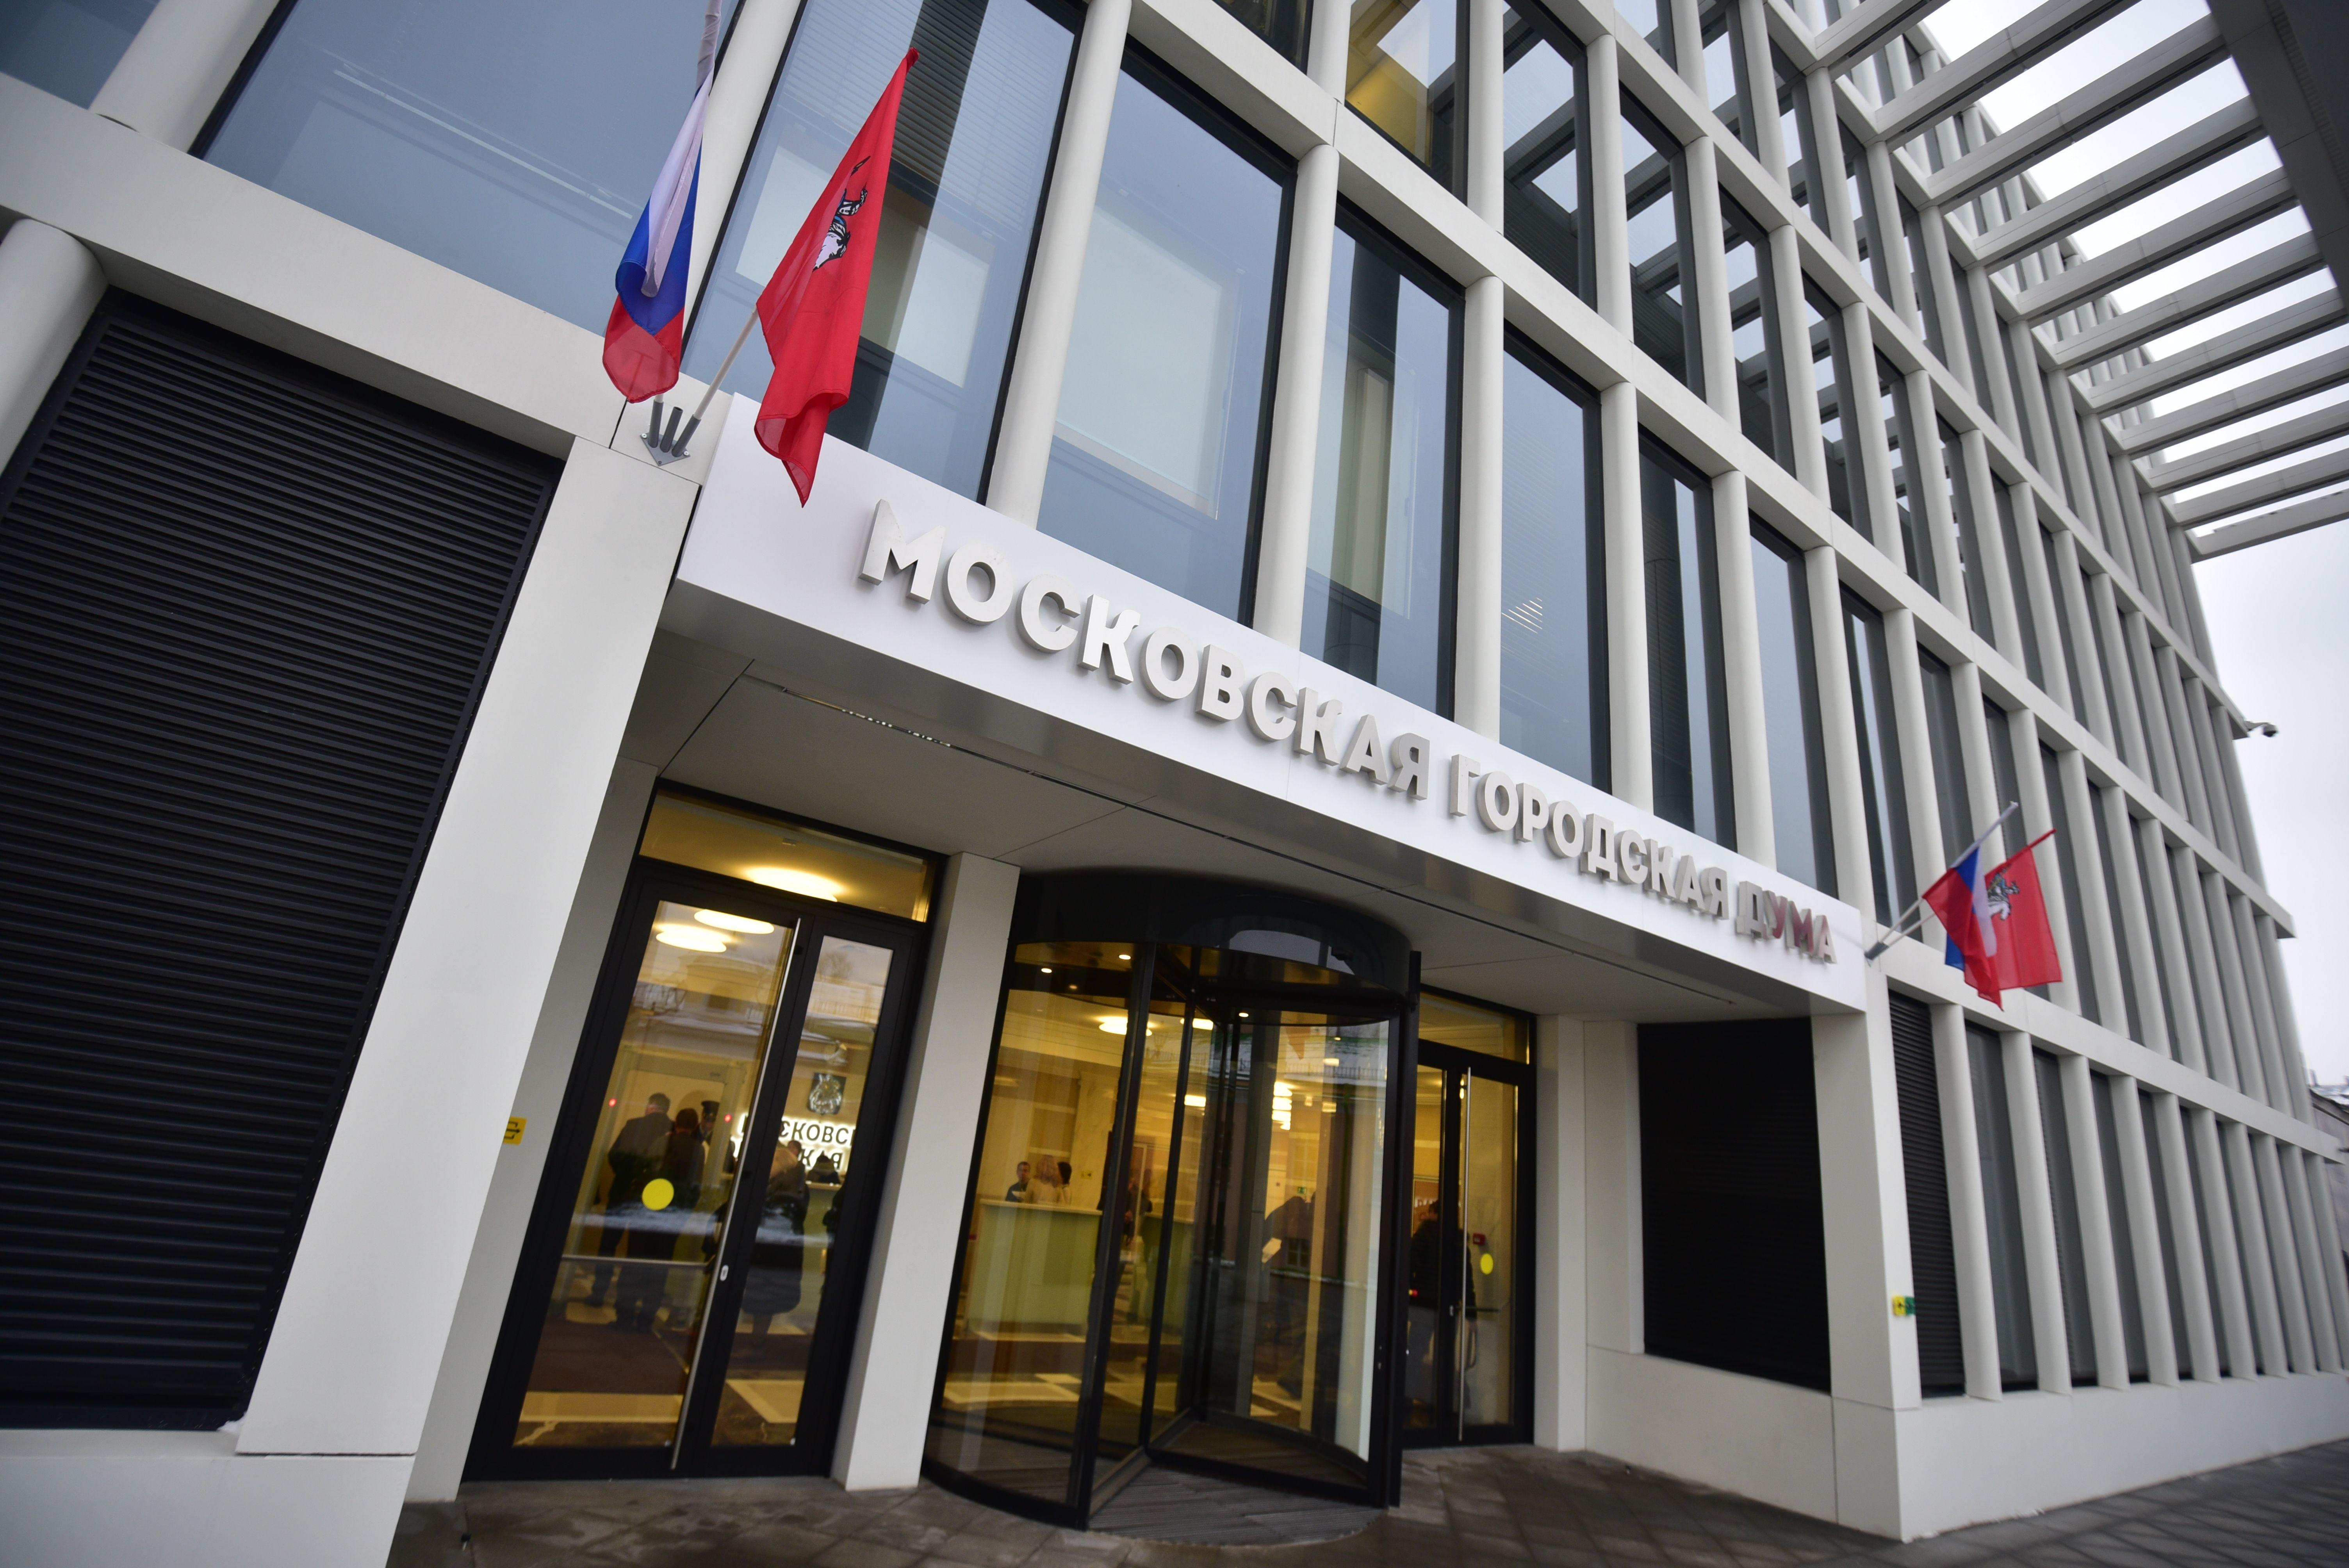 Мосгордума приняла закон о дистанционном электронном голосовании